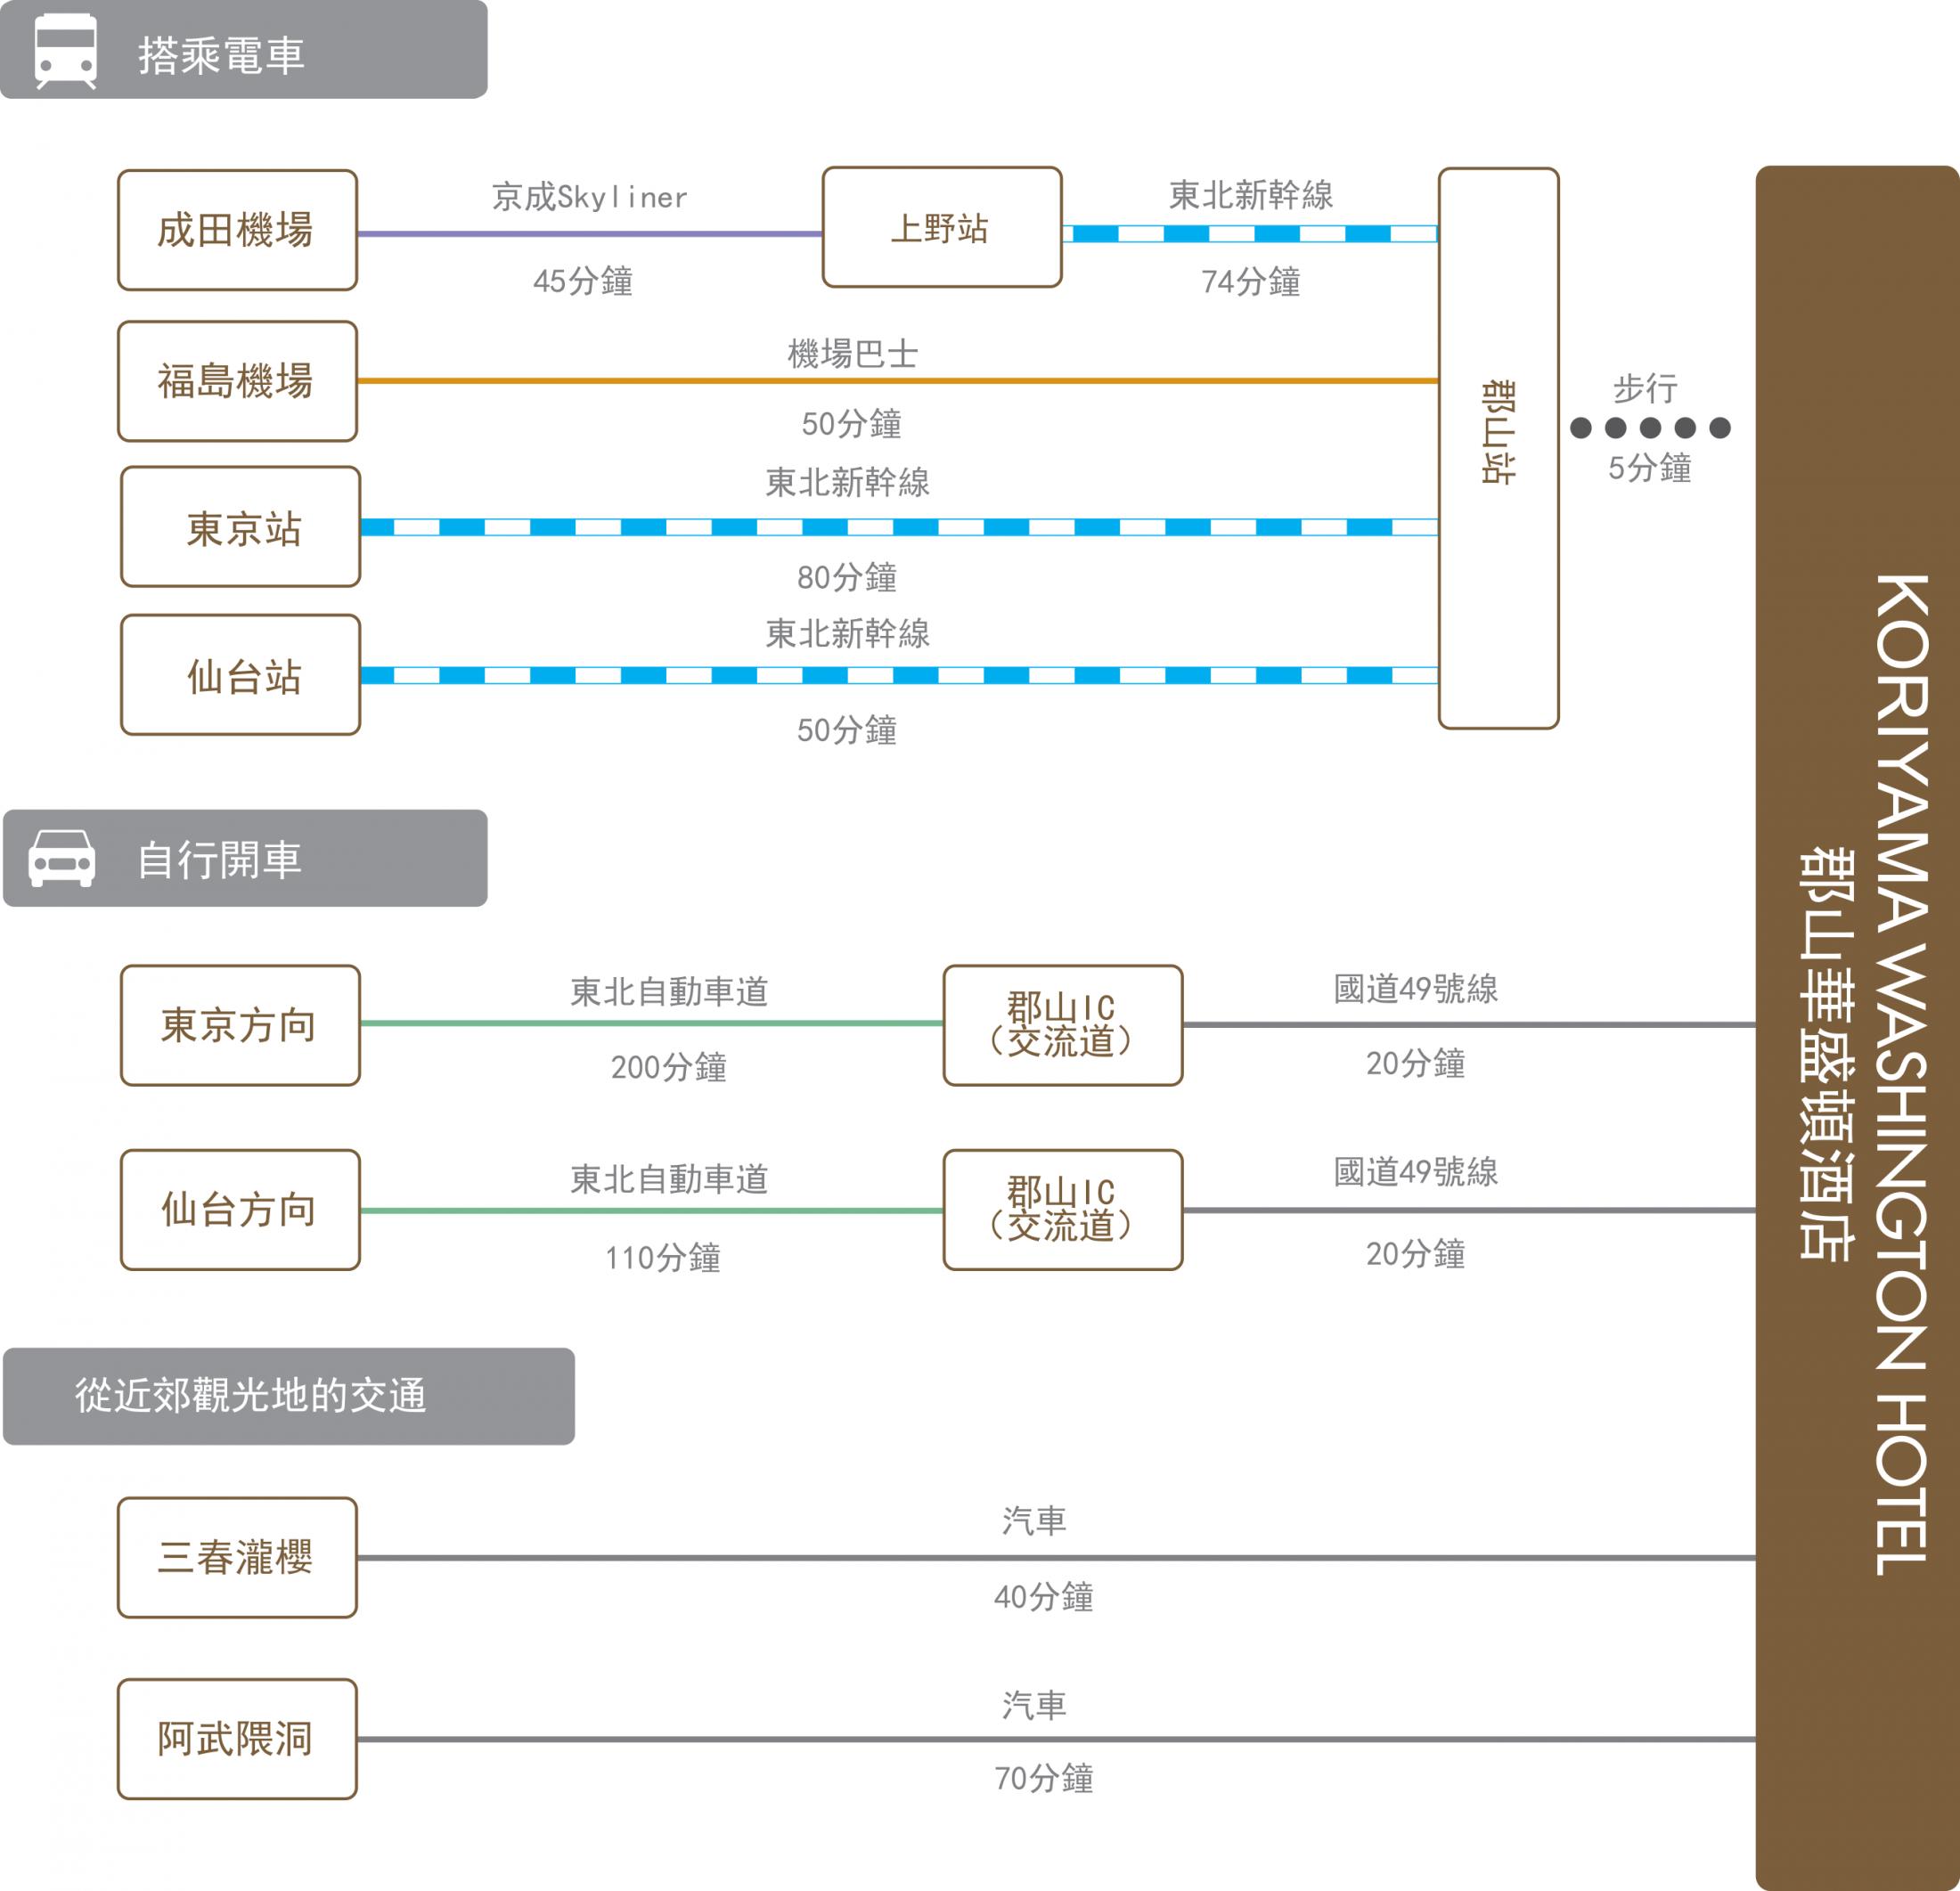 chart_zh_tw_koriyama_wh